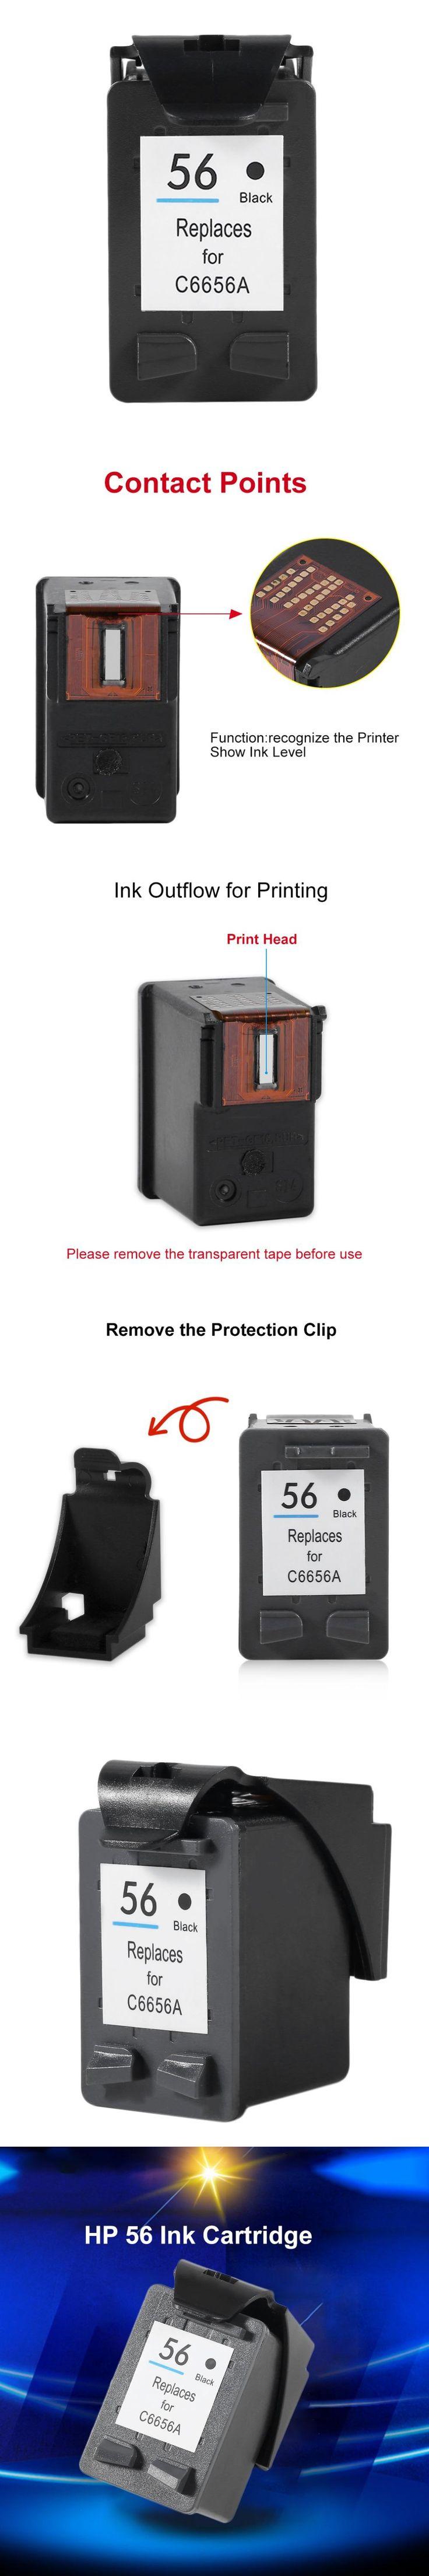 For HP 56 ink Cartridge HP56 For HP Deskjet 5150 450CI 5550 5650 7760 9650 PSC